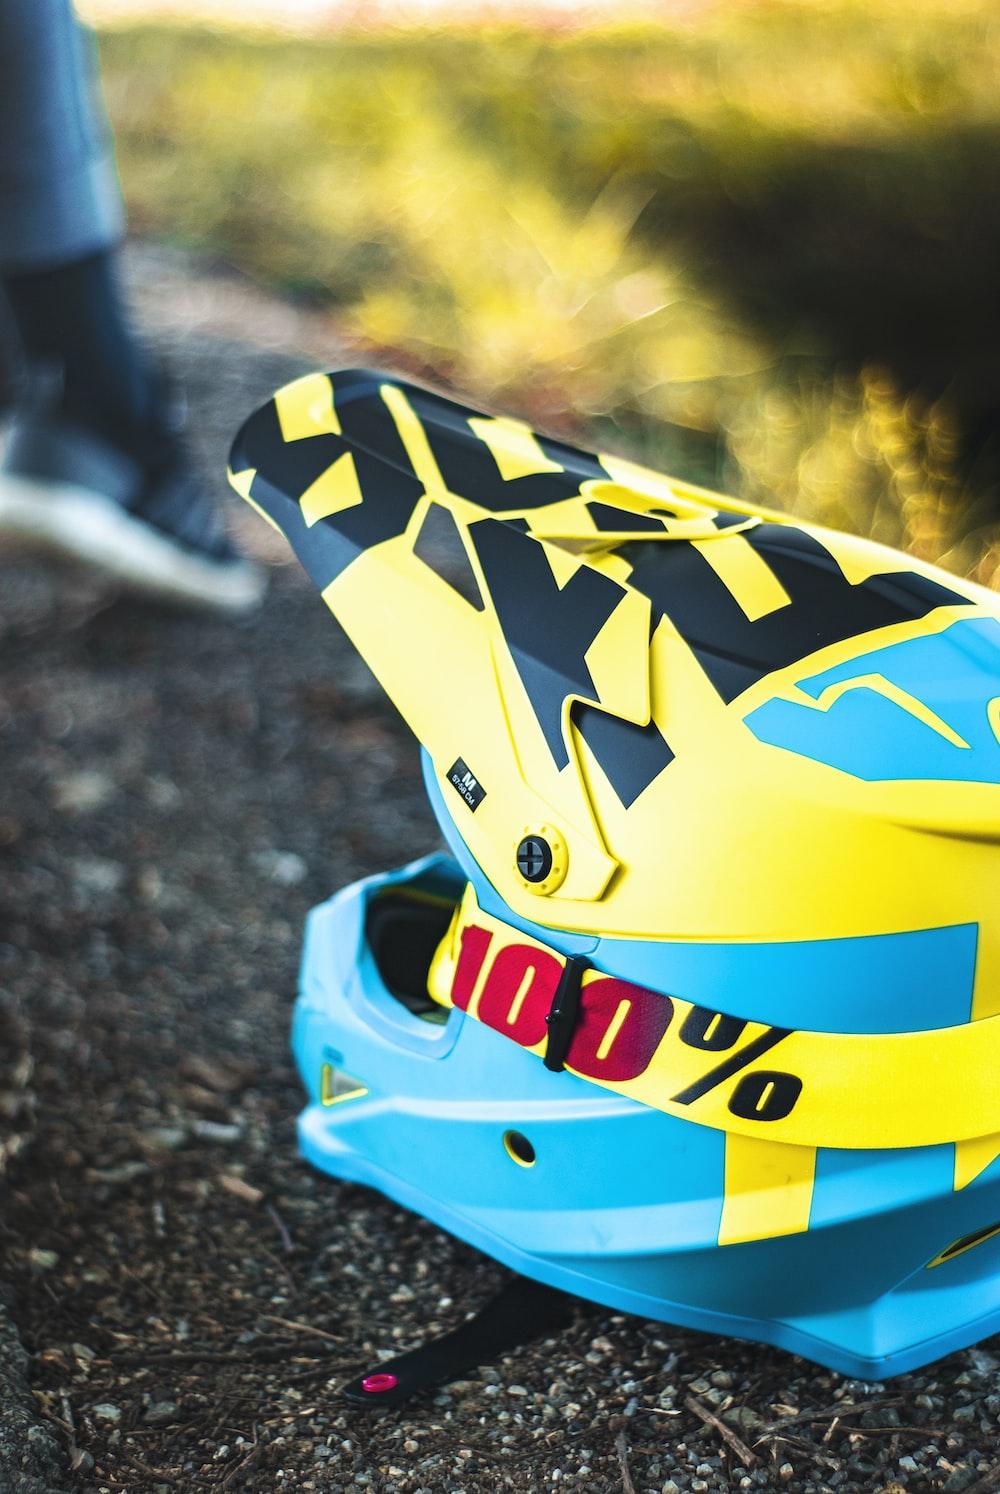 blue, yellow, and black motocross helmet